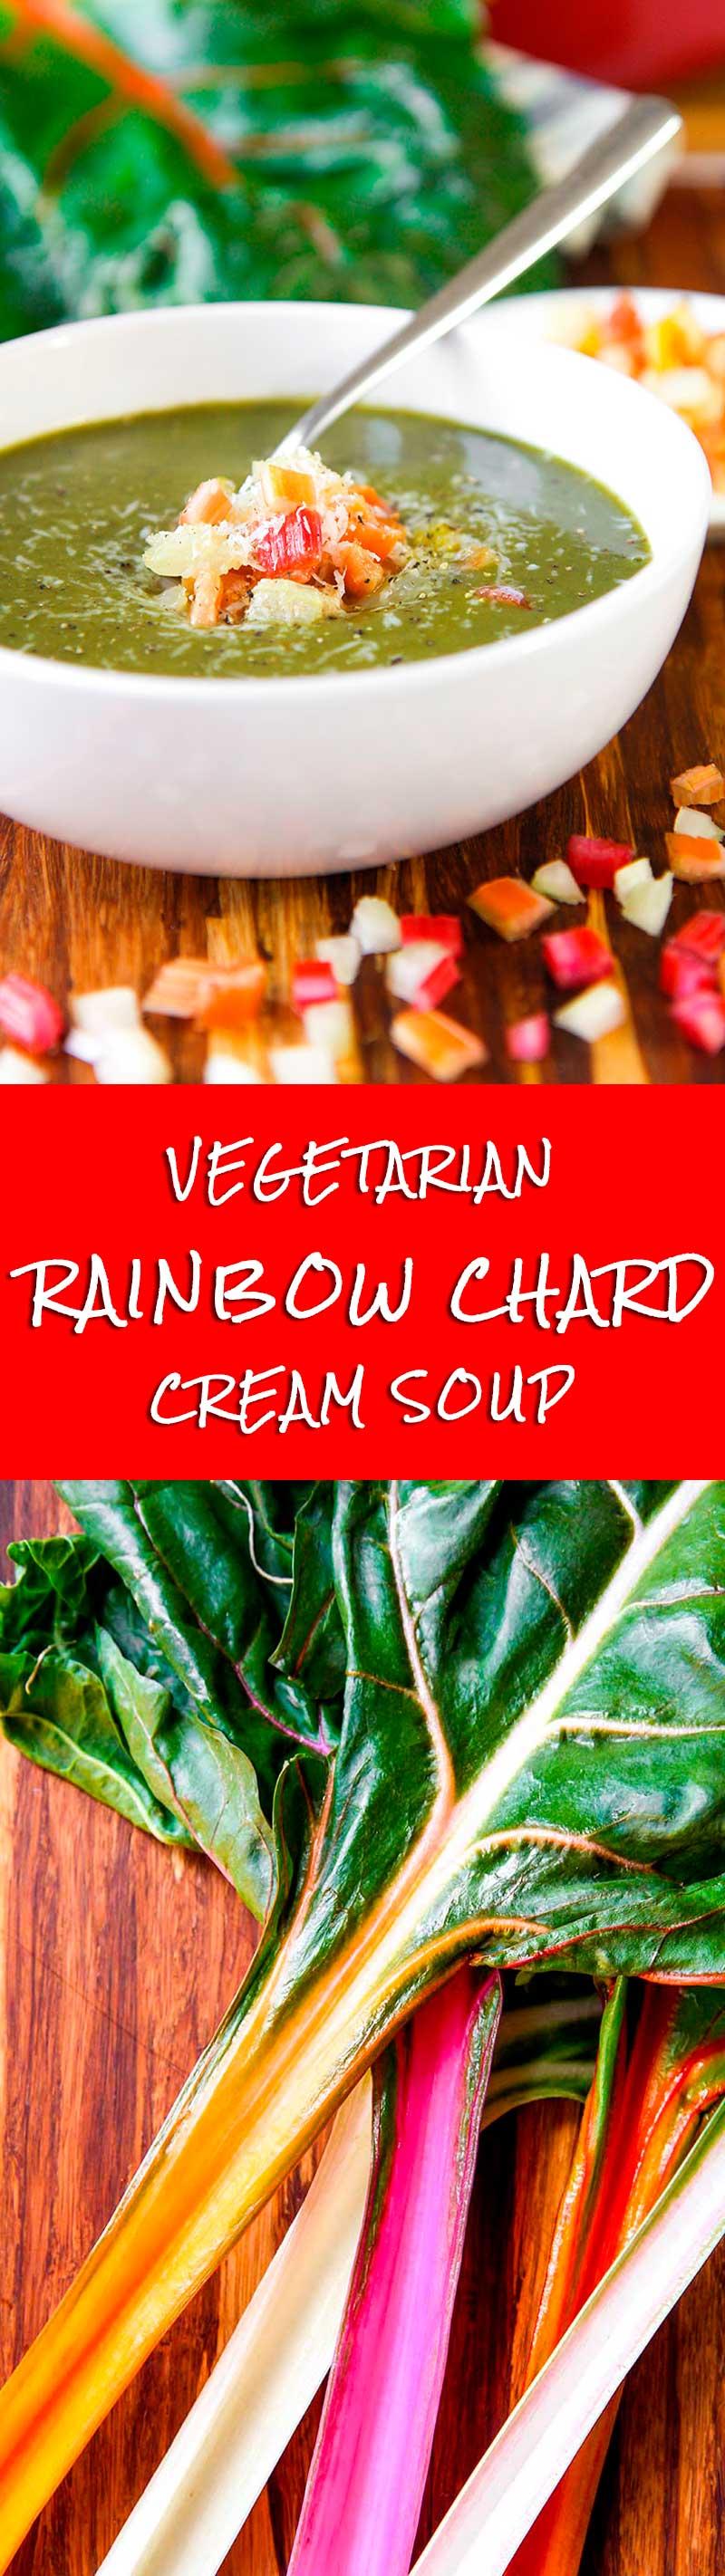 RAINBOW CHARD CREAM SOUP